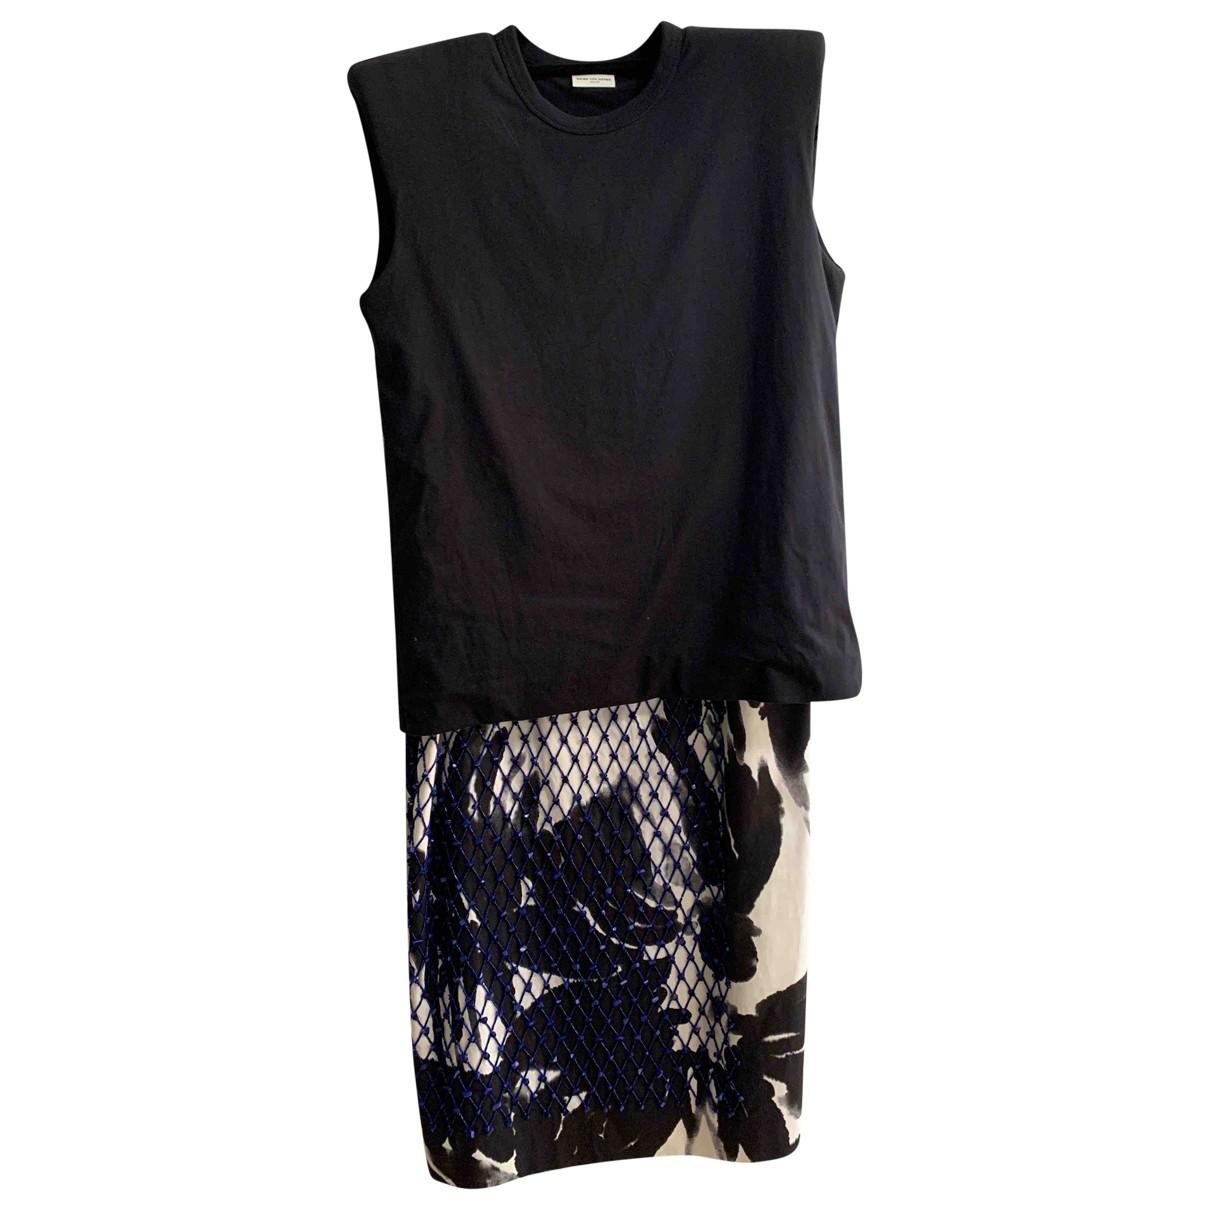 Dries Van Noten \N Black Cotton dress for Women S International